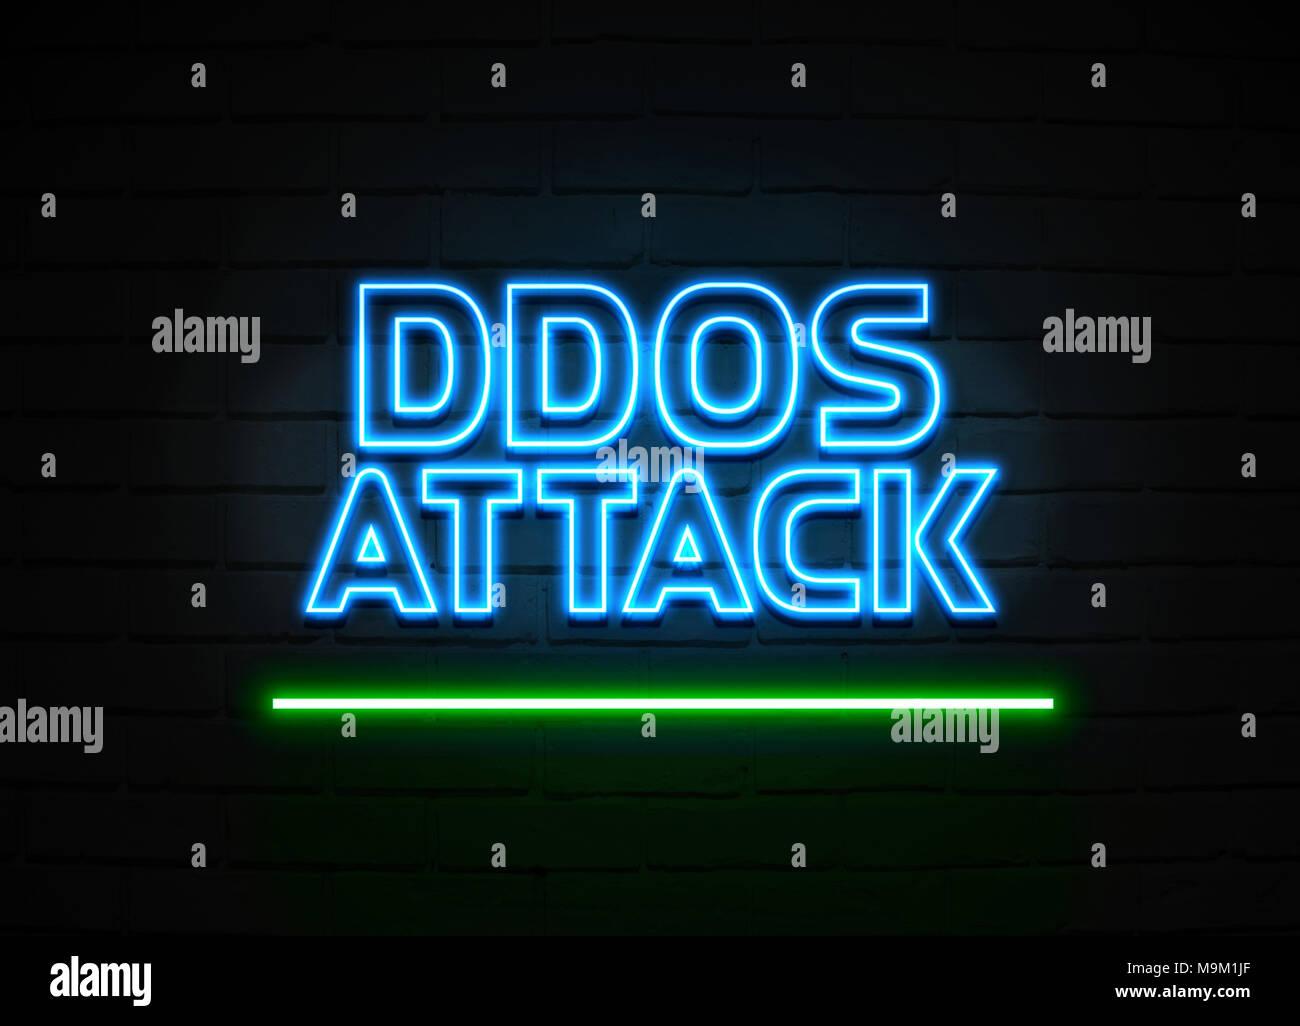 ddos attack stock photos ddos attack stock images alamy